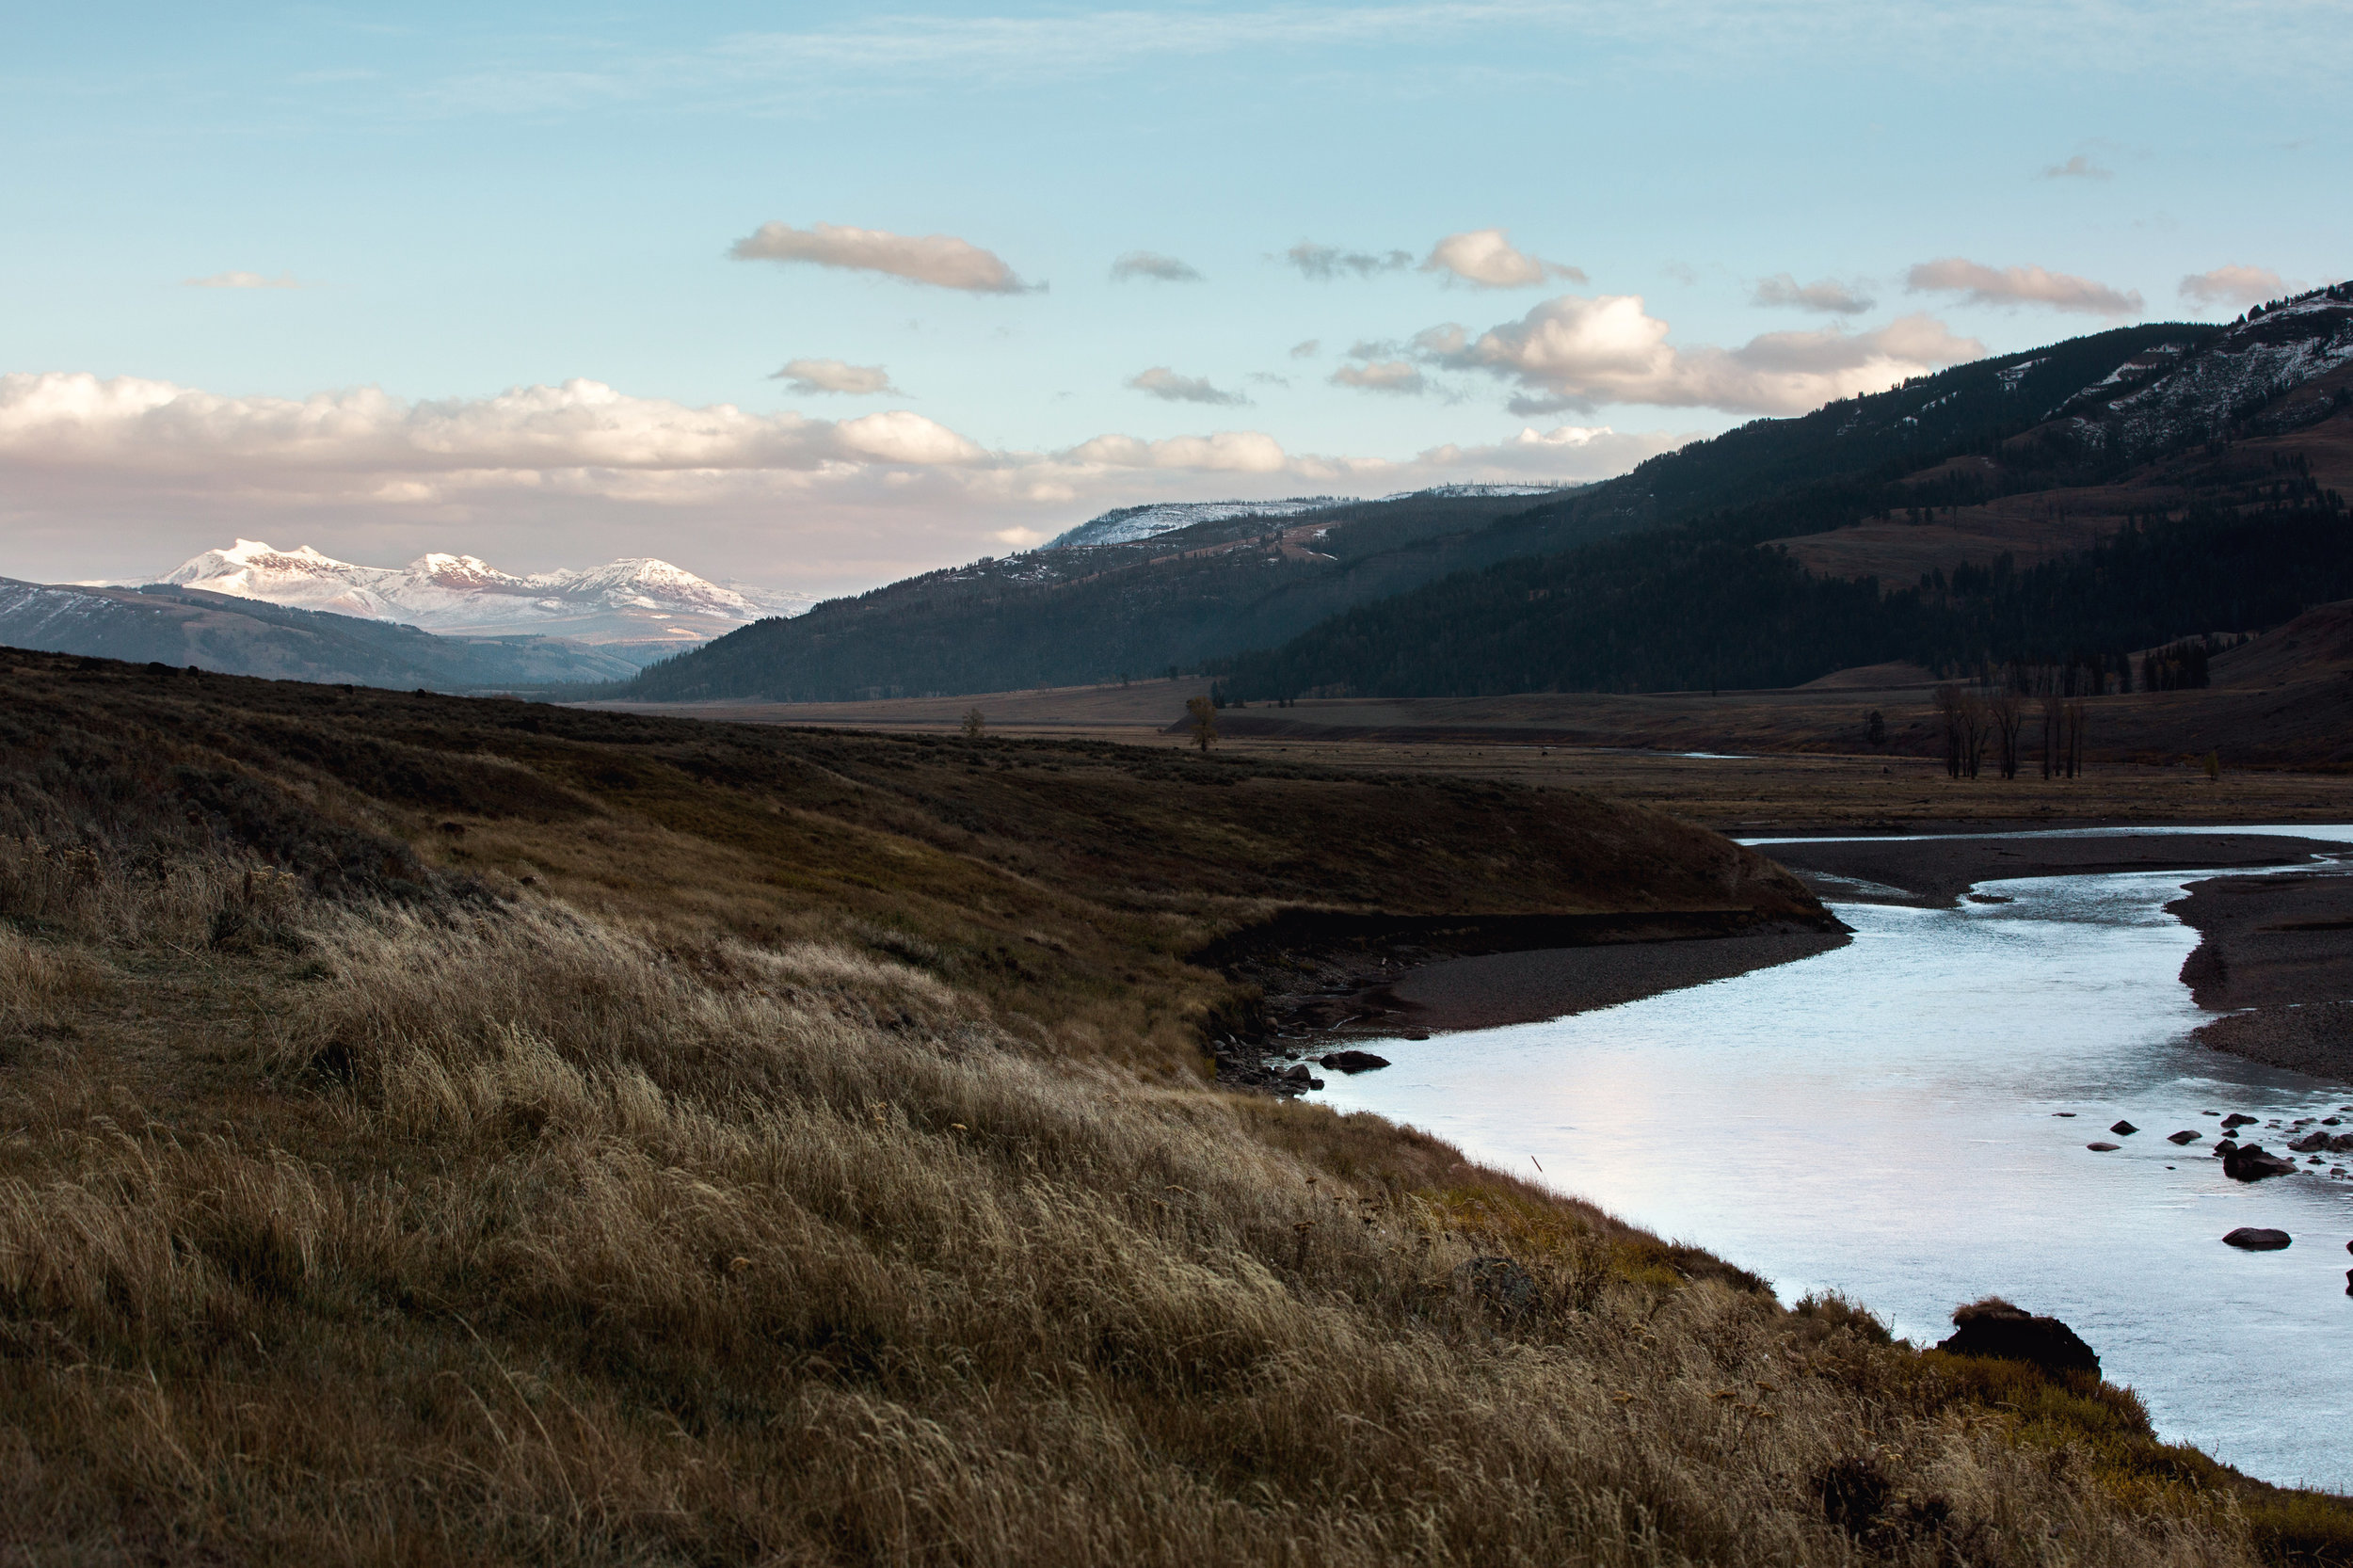 CindyGiovagnoli_Yellowstone_National_Park_Wyoming_Montana_mountains_sunset_roadtrip_river.jpg